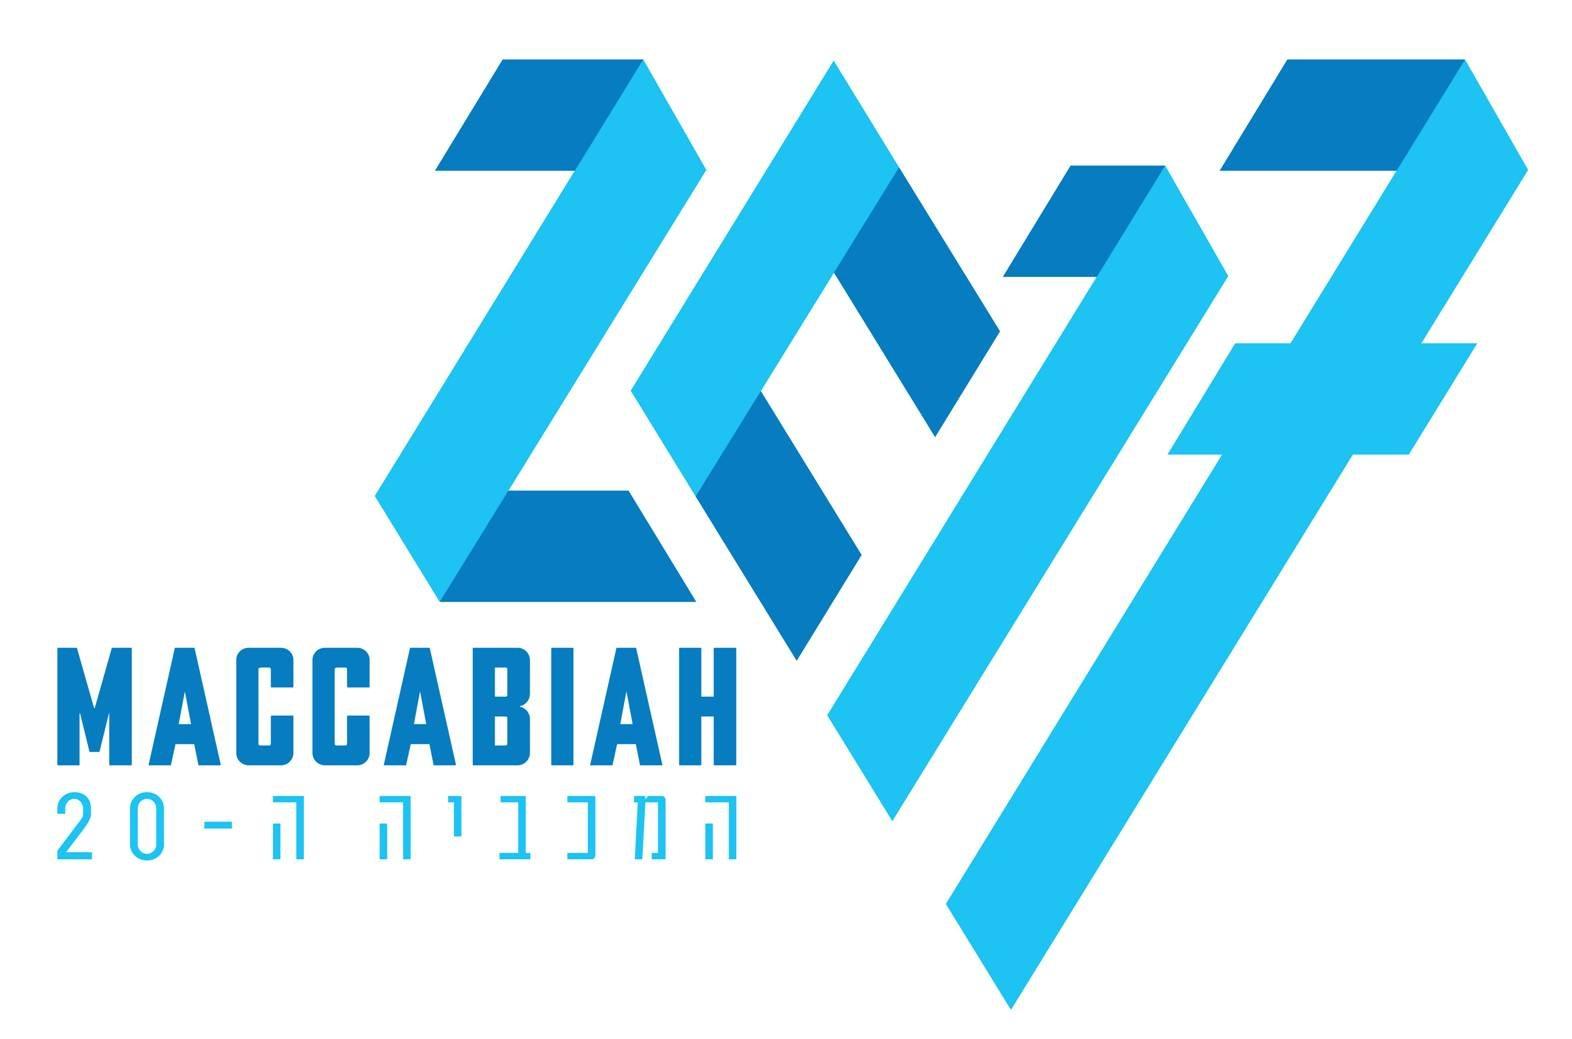 Maccabiah-2017